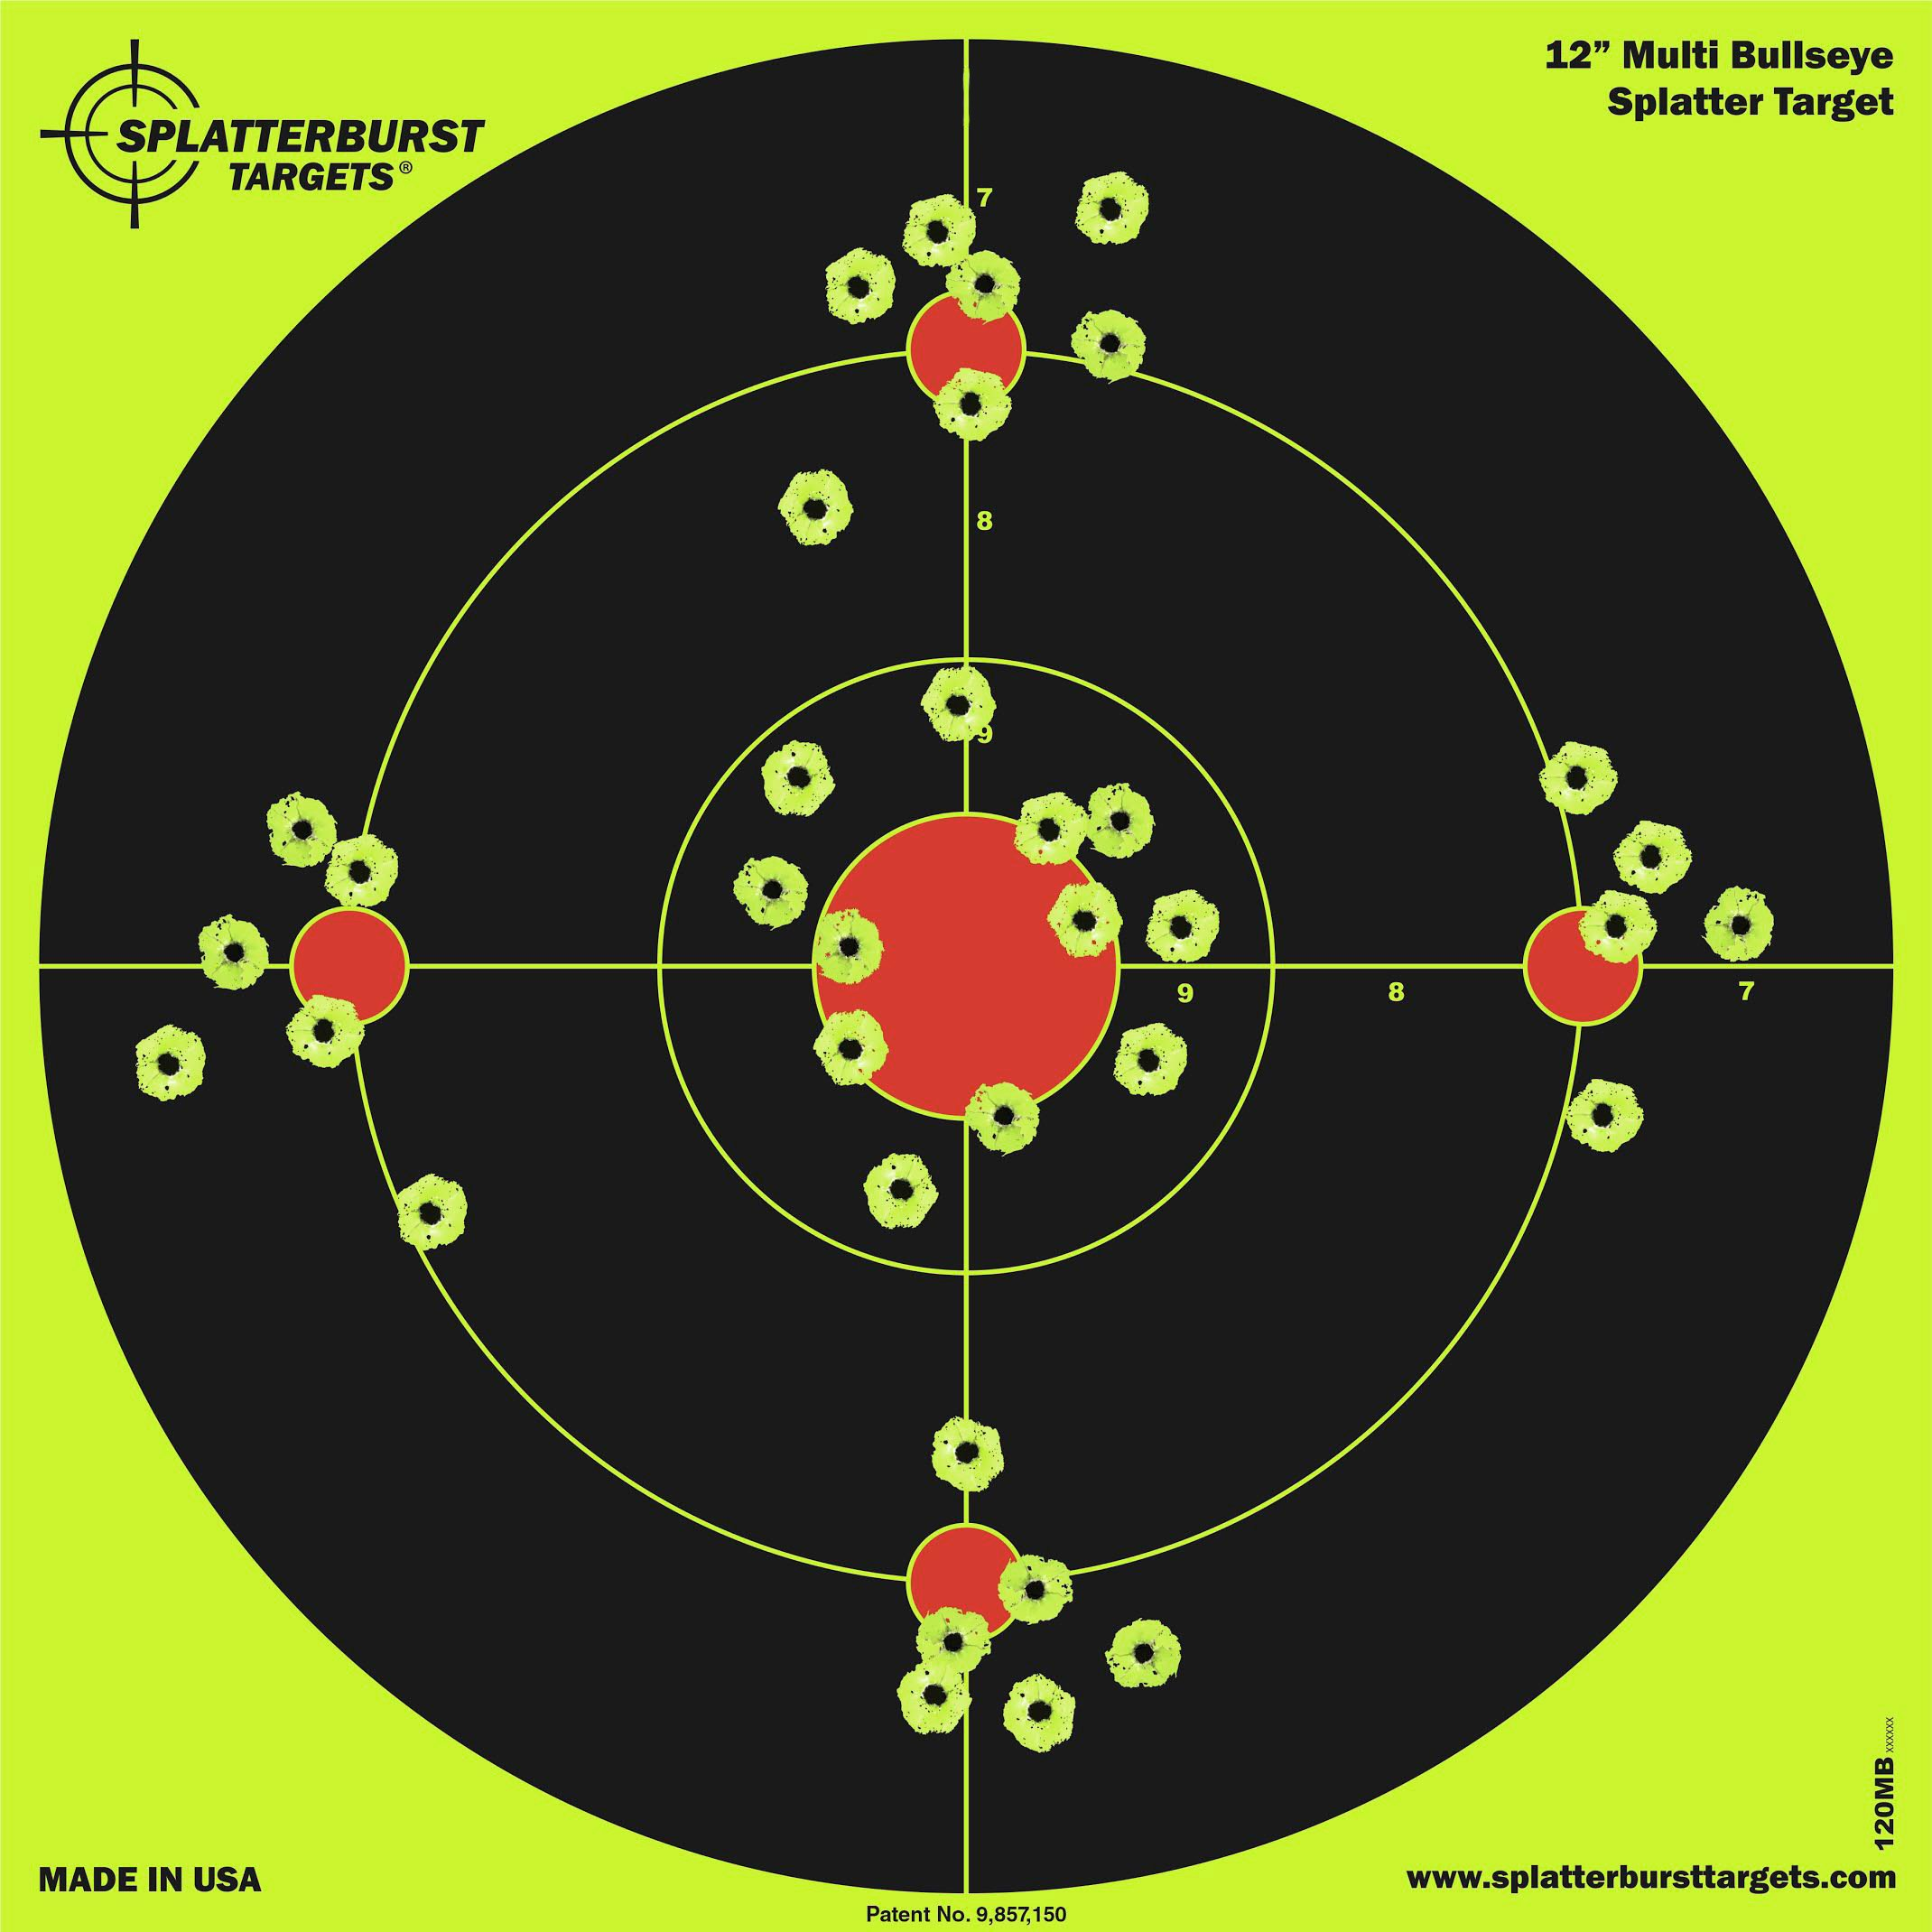 Splatterburst Targets - 12 inch Multi-Bullseye Reactive Shooting Target - Shots Burst Bright Fluorescent Yellow Upon Impact - Gun - Rifle - Pistol - AirSoft - BB Gun - Pellet Gun - Air Rifle (10 Pack)